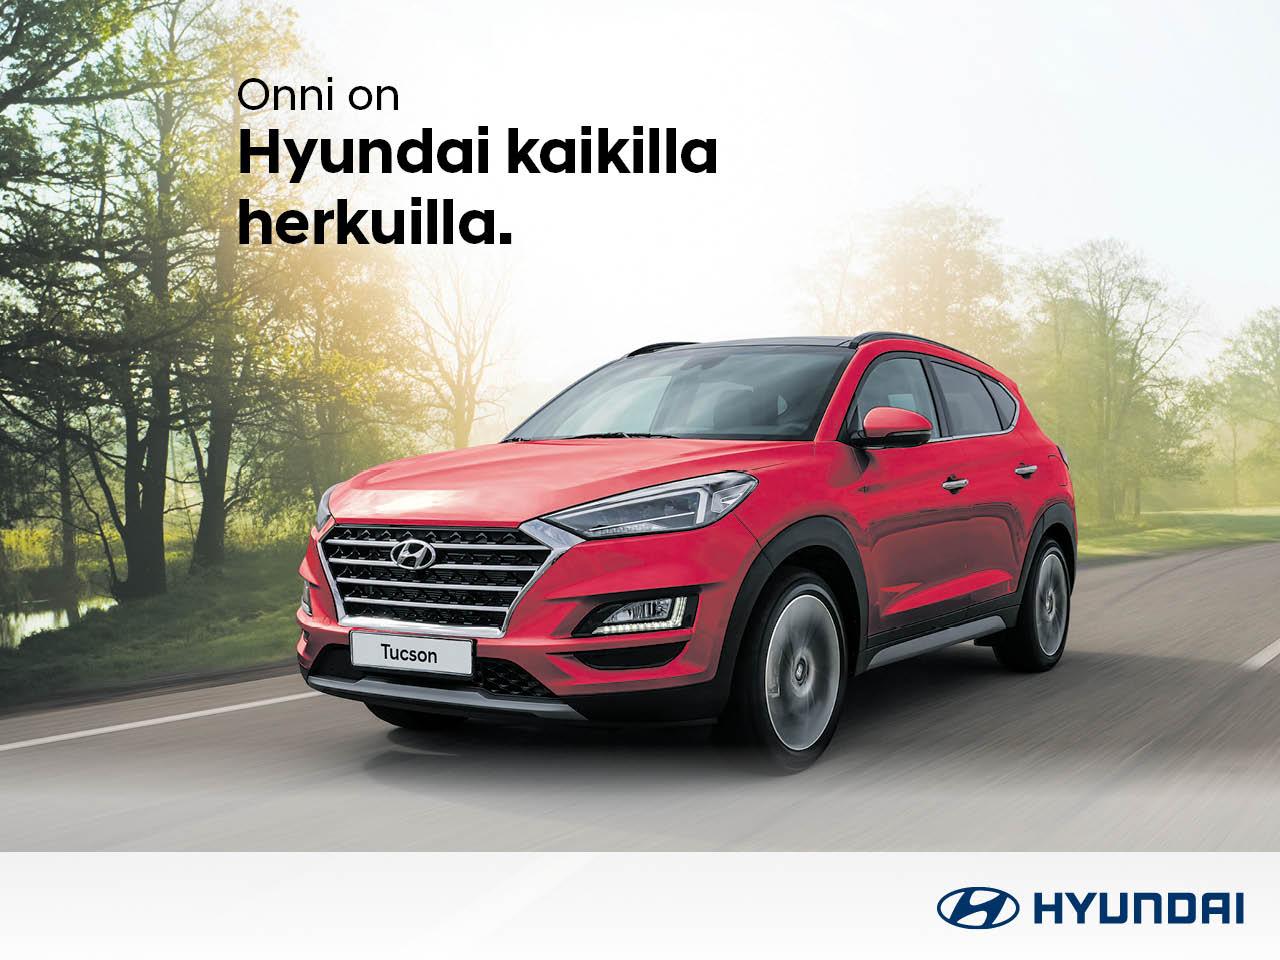 Hyundai Tucson Limited Plus - kaikilla herkuilla